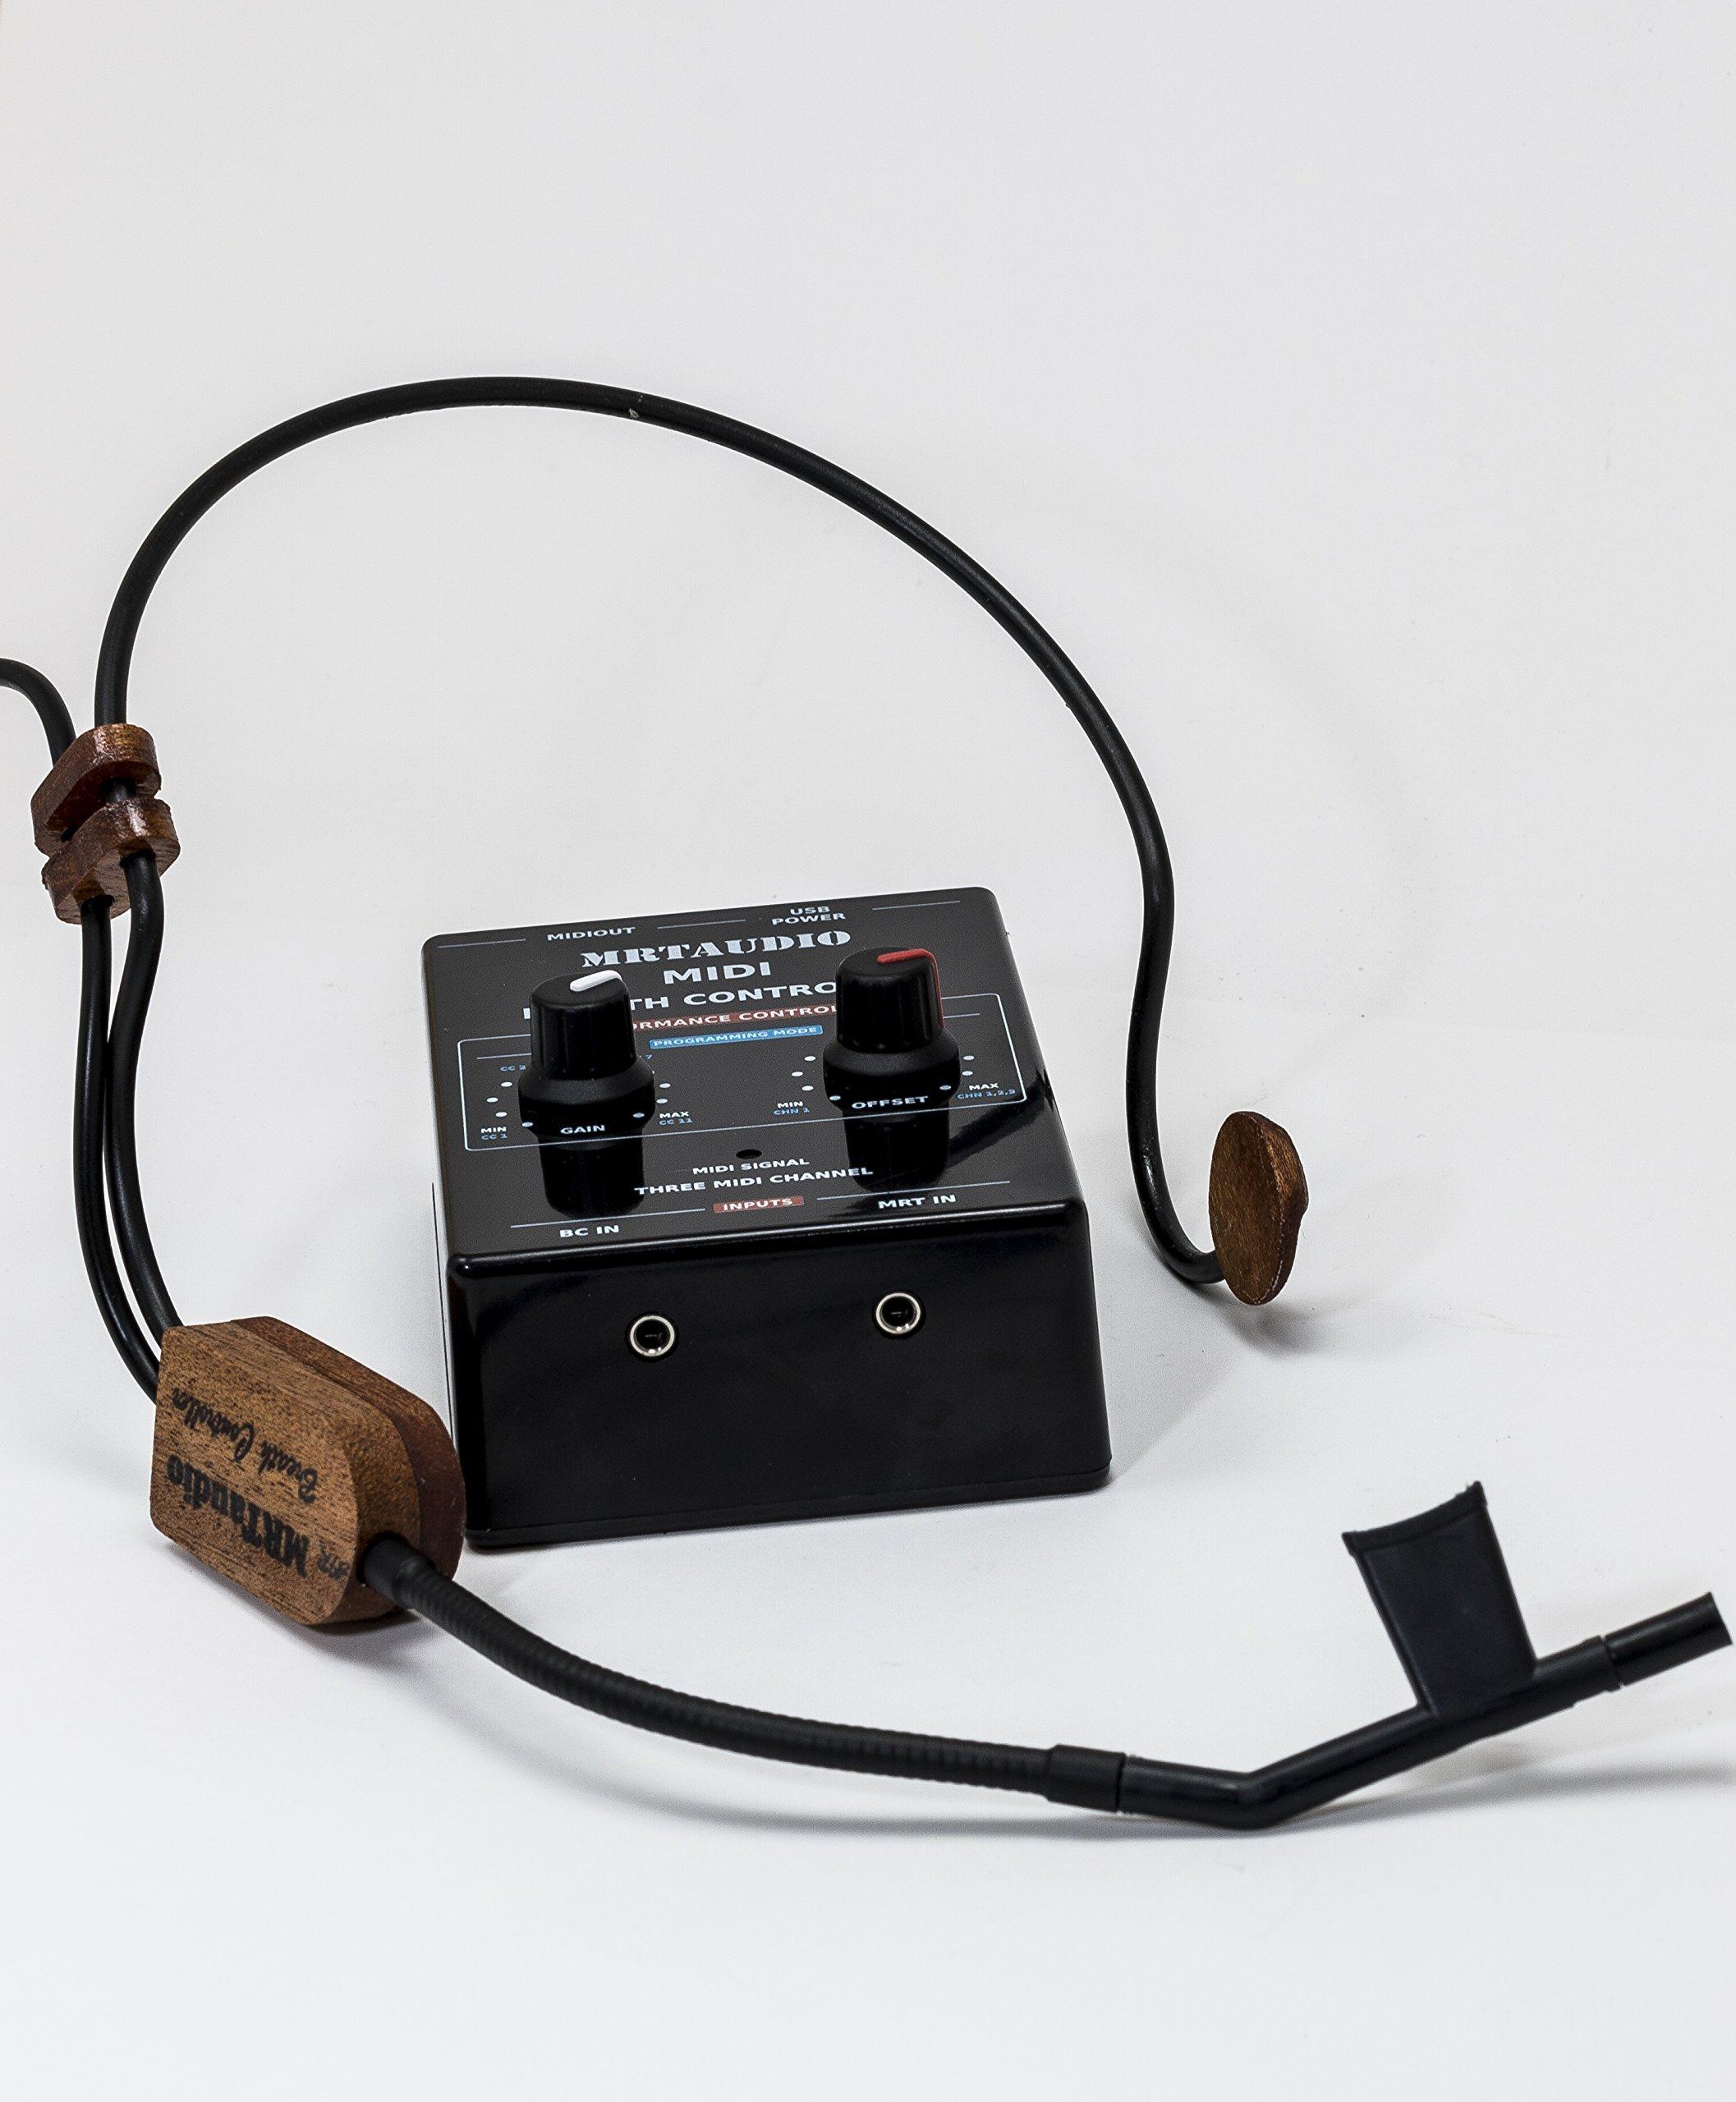 Mrtaudio Midi Breath Controller v2 for Yamaha bc3a by Mrtaudio (Image #5)